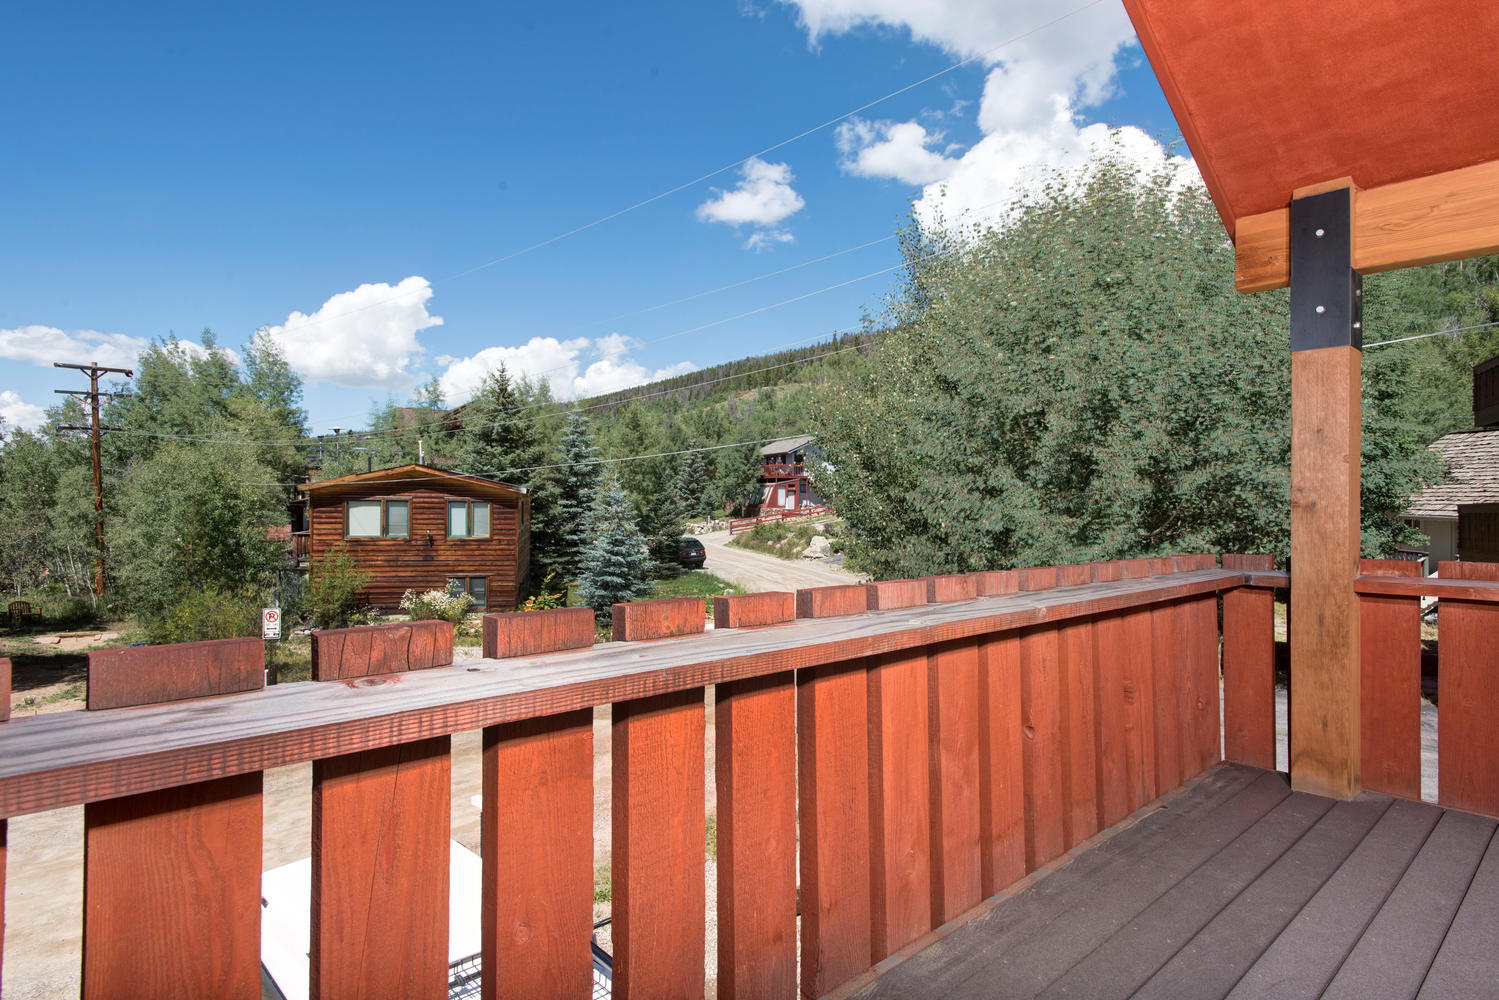 Single Family Home for Sale at 127 Rasor Drive - Loveland Pass Village Keystone, Colorado, 80435 United States